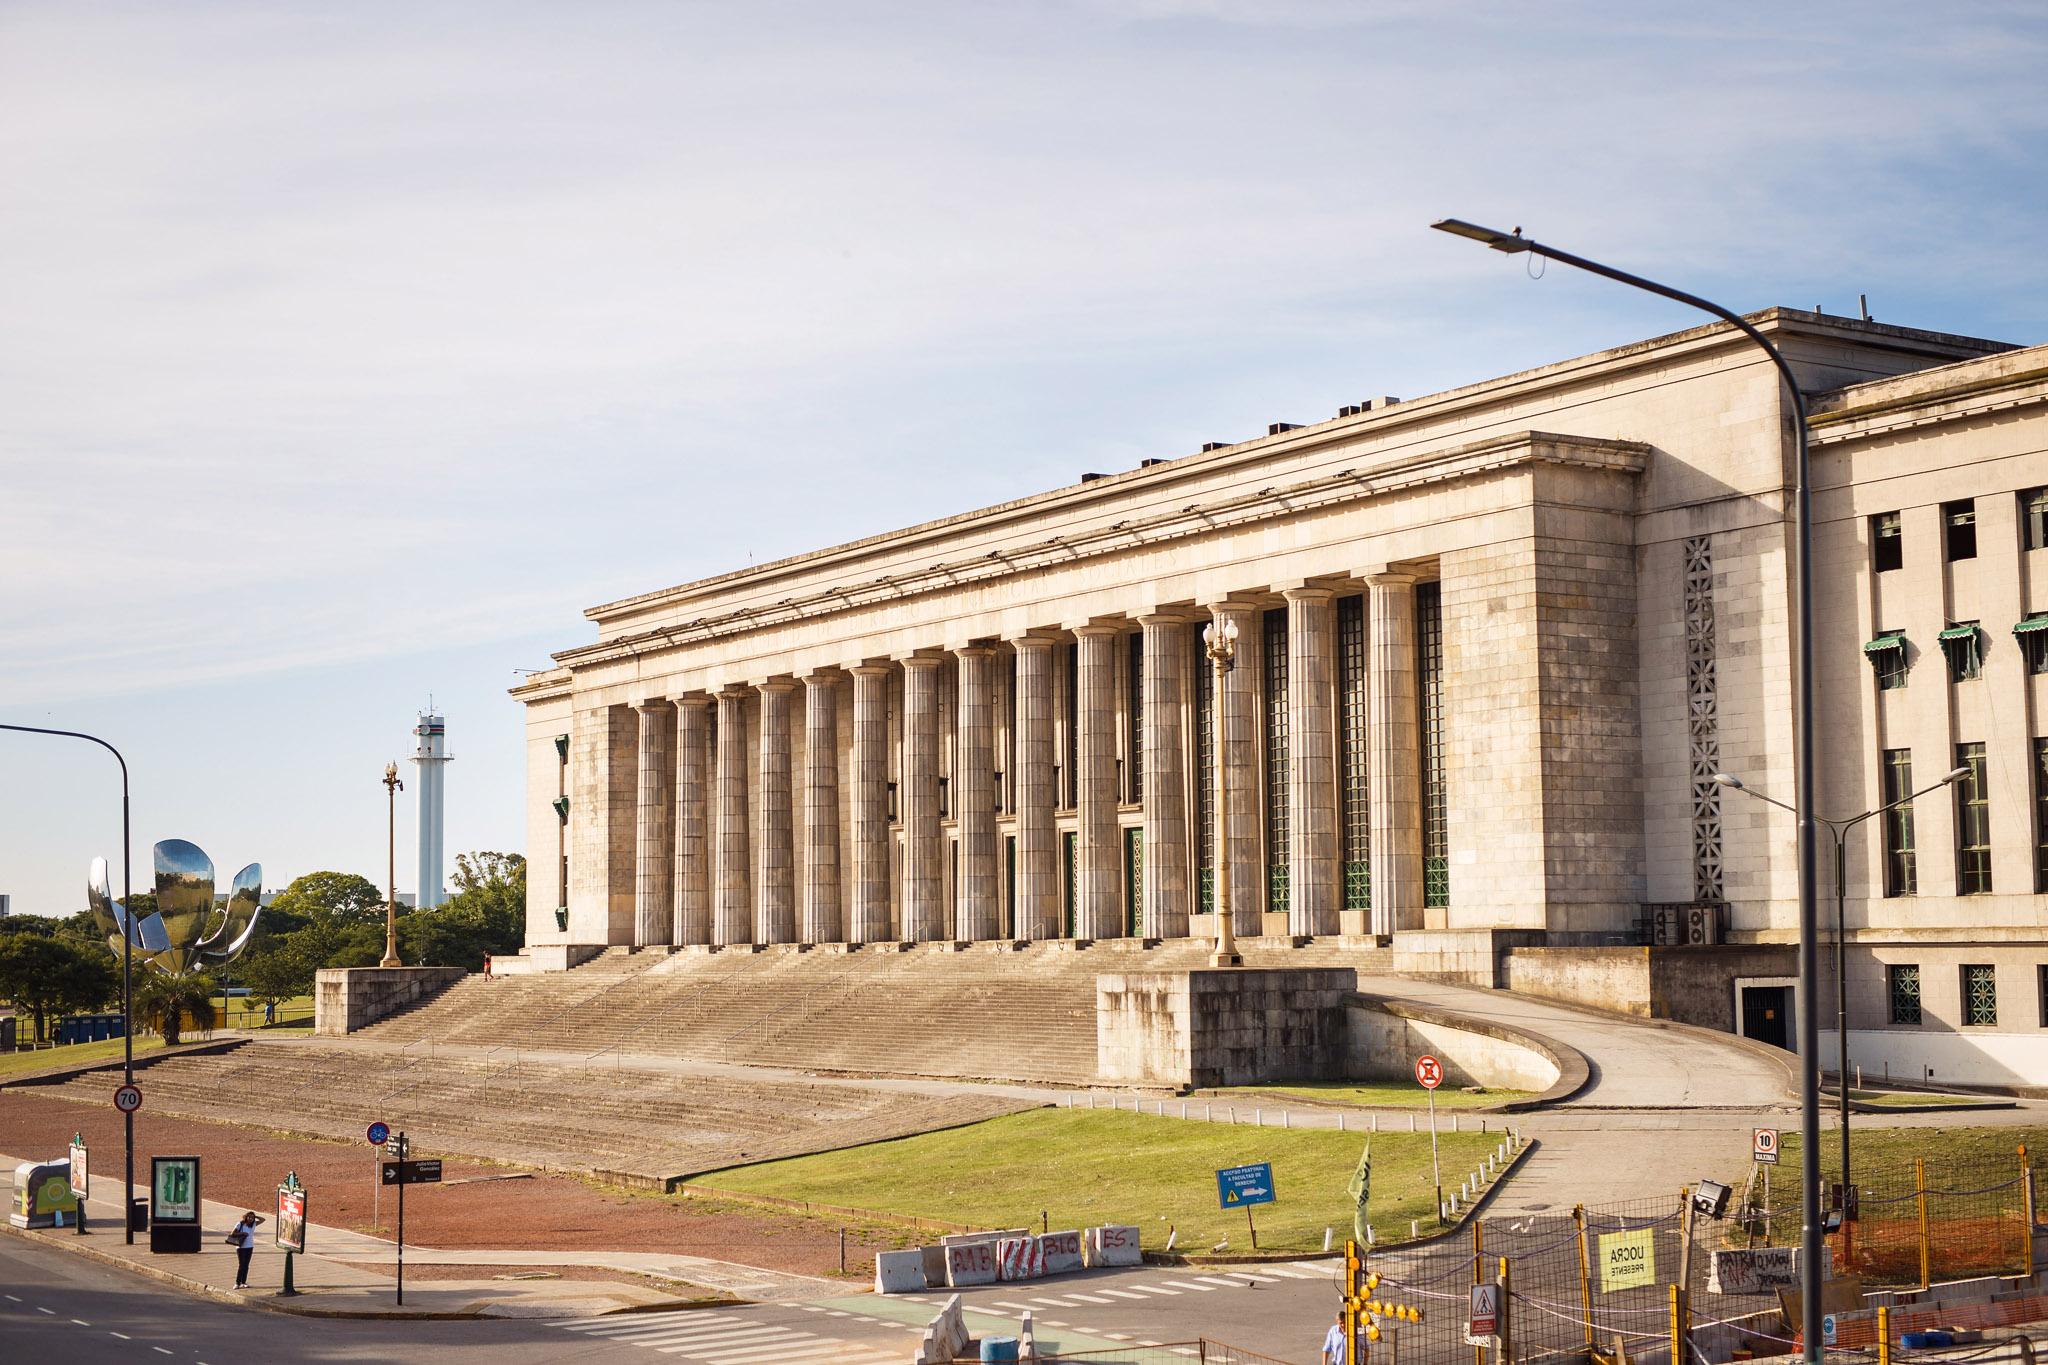 Wedding-travellers-Argentina-Buenos-Aires-Law-school-university